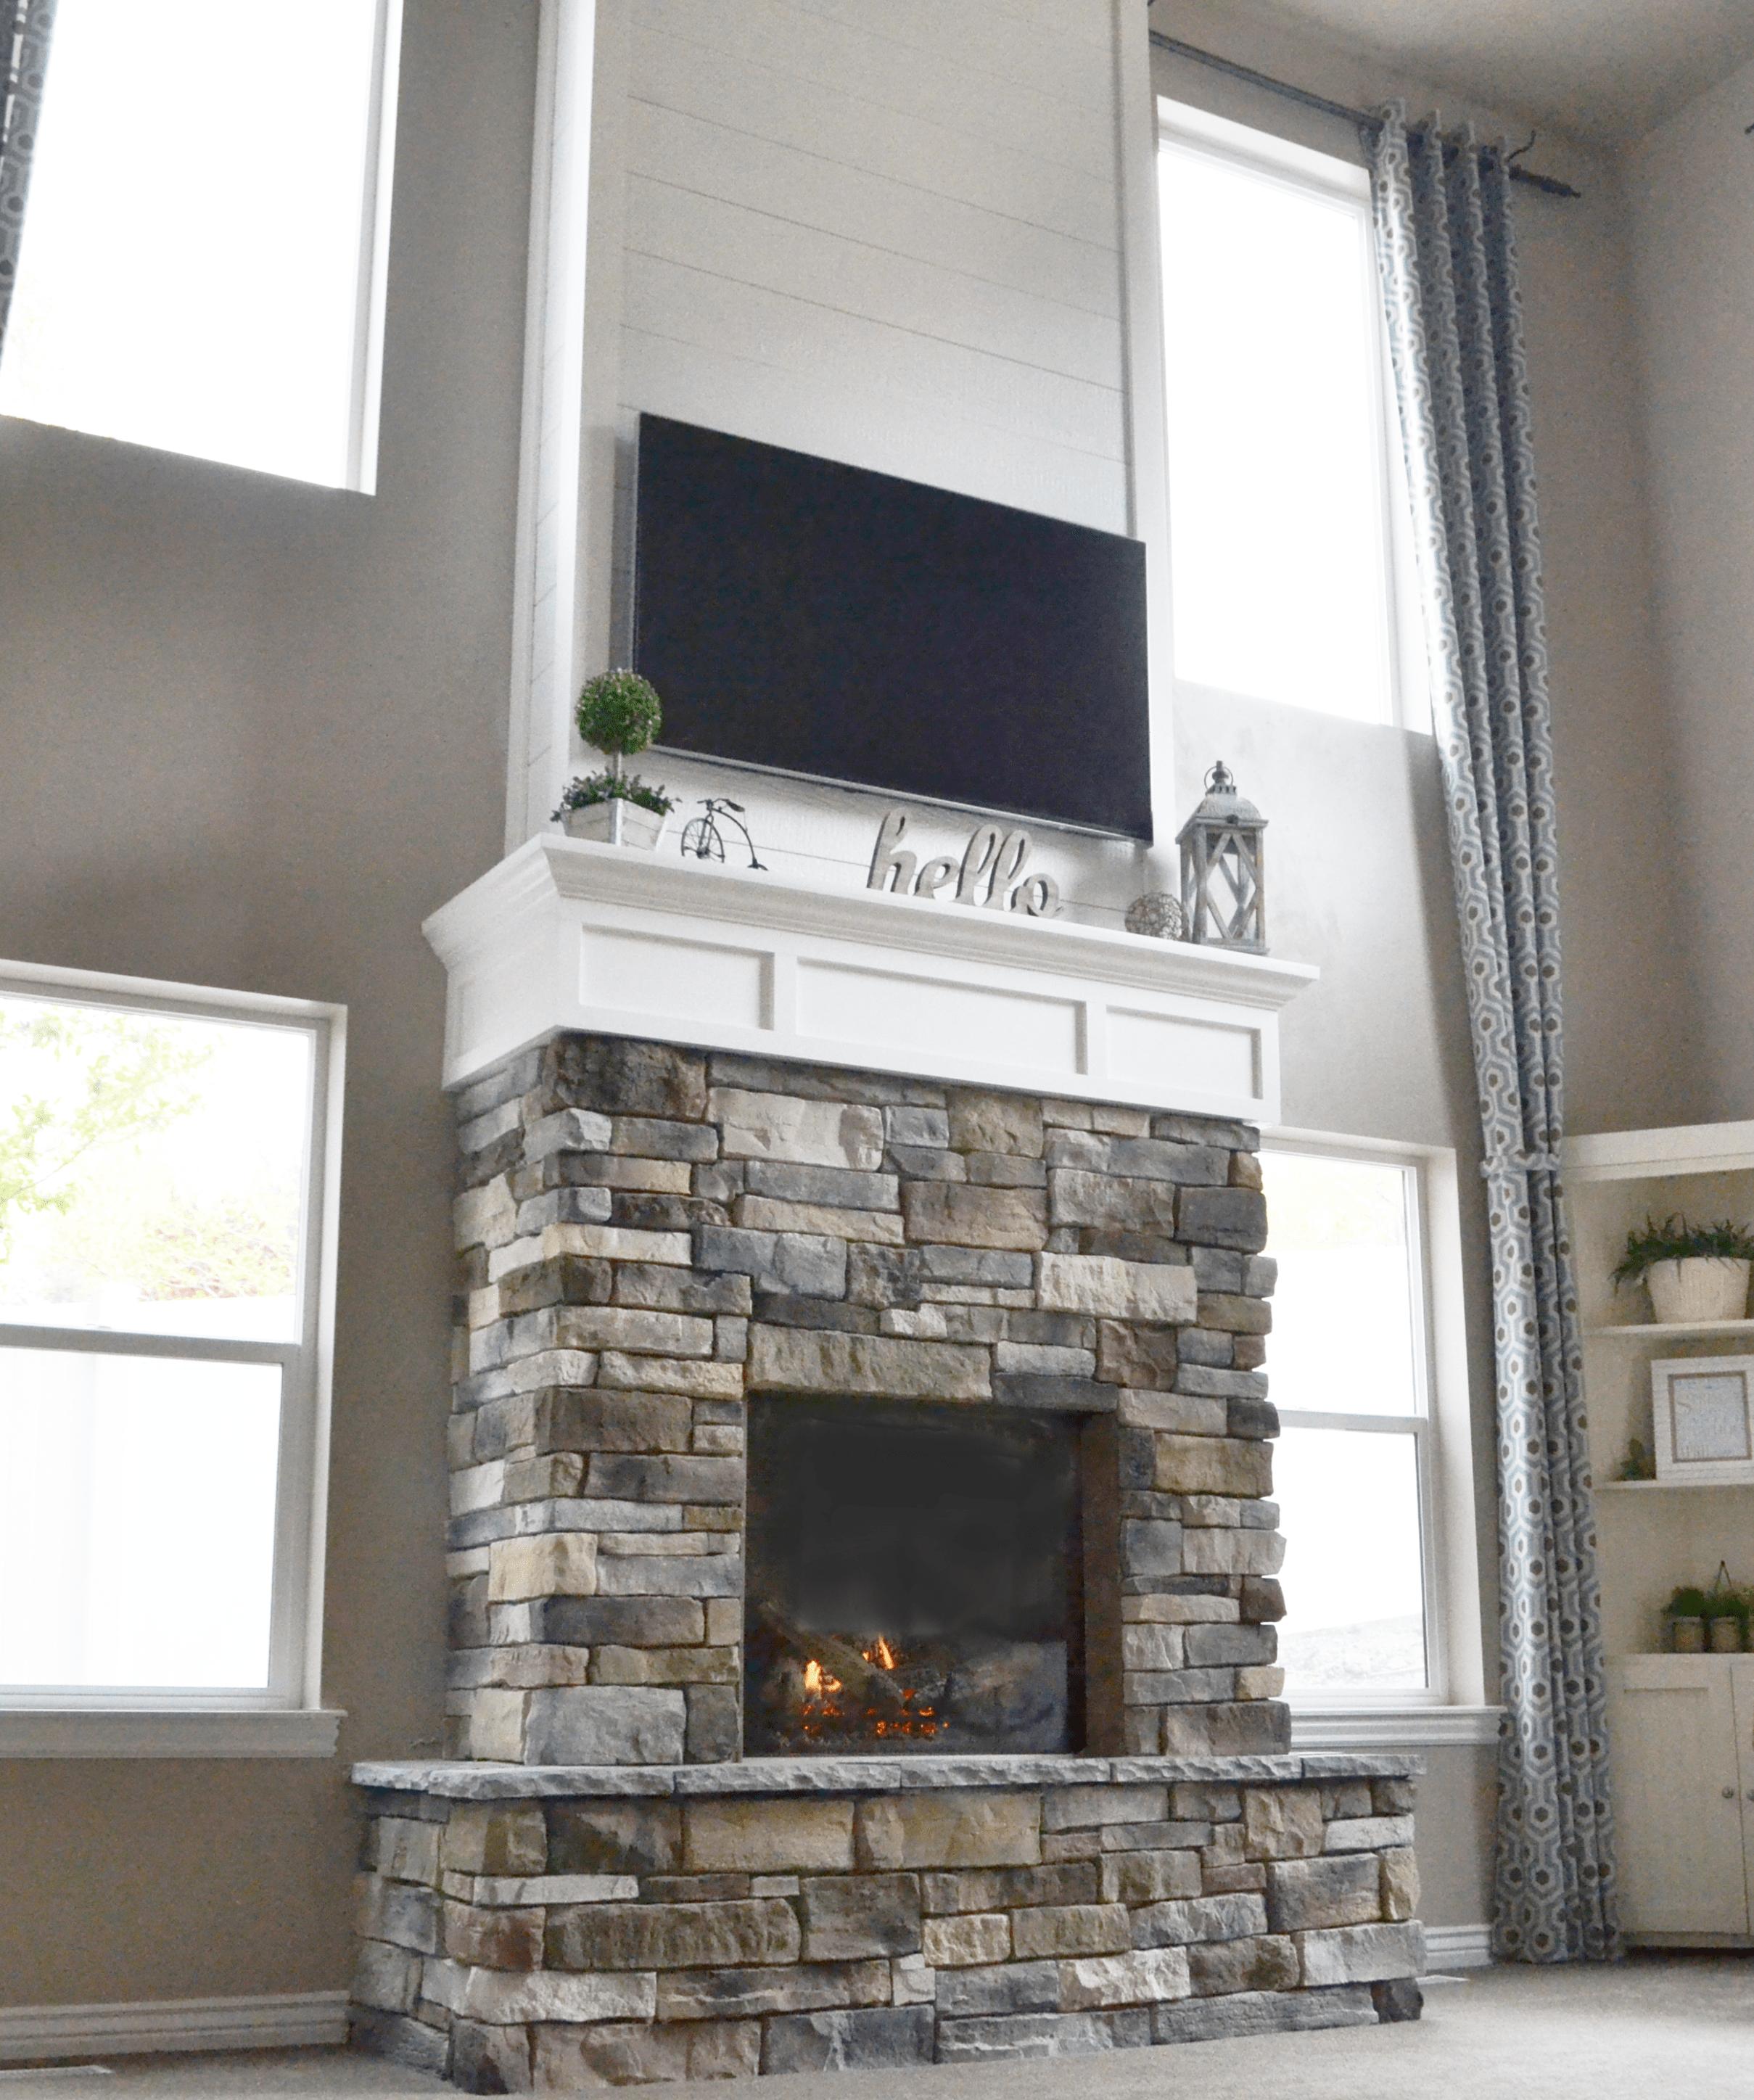 DIY Fireplace with Stone & Shiplap Diy fireplace, Build